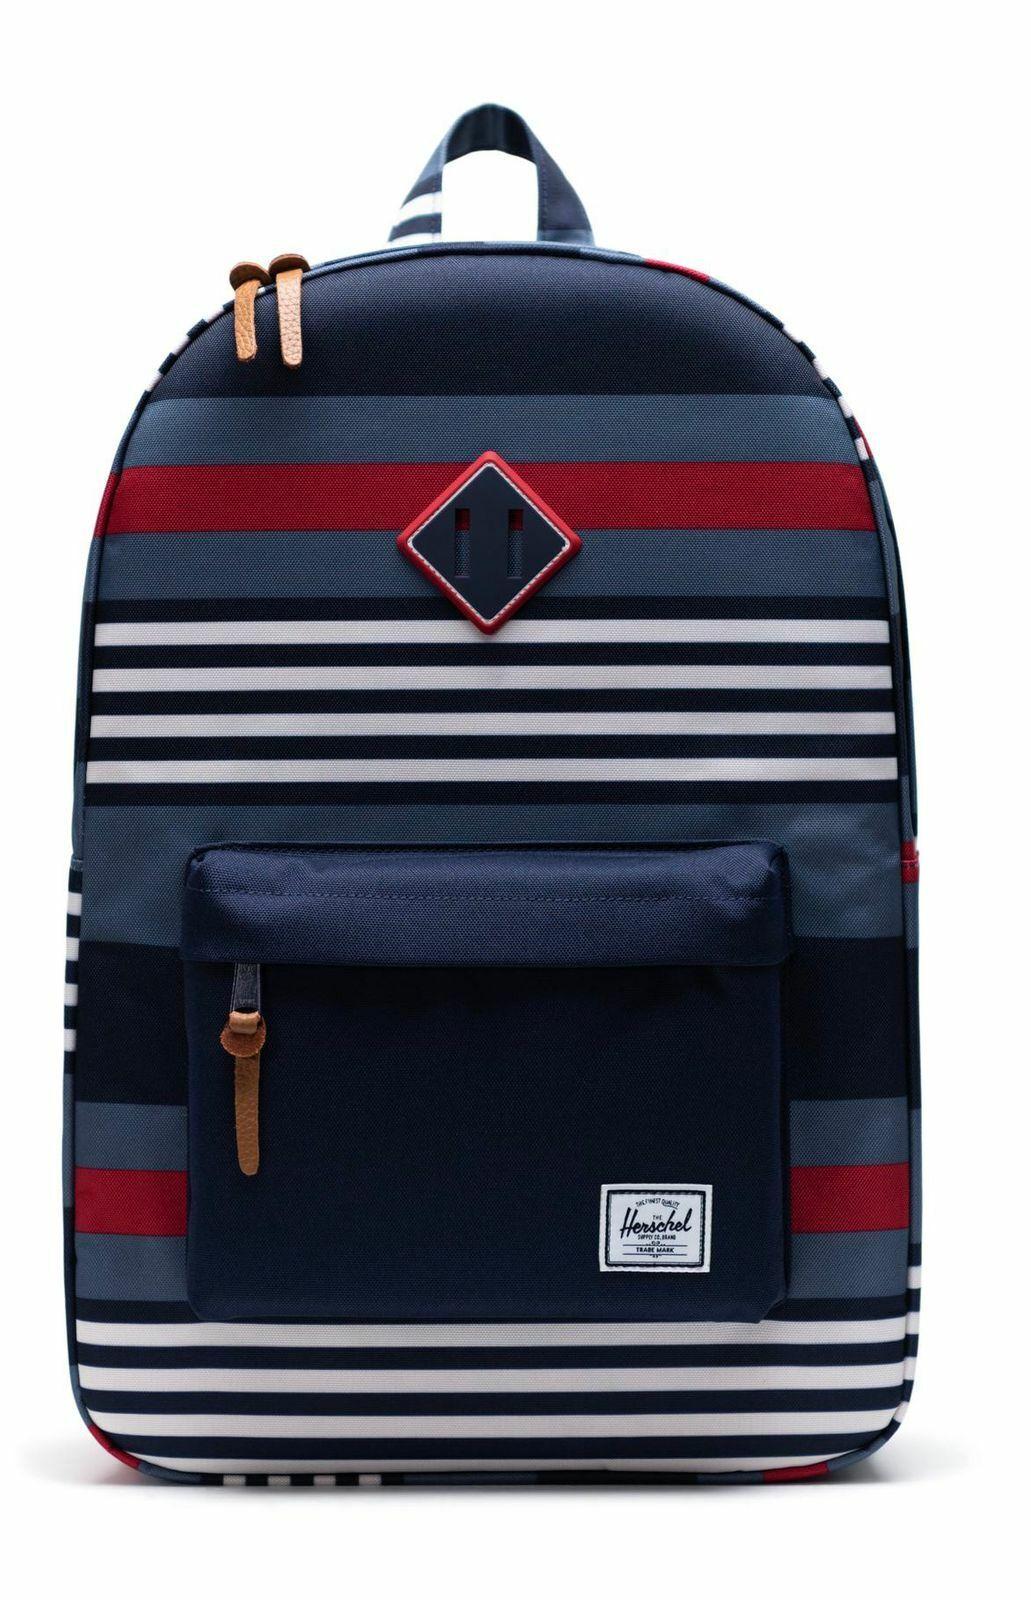 Herschel Backpack Malibu Stripe Peacoat